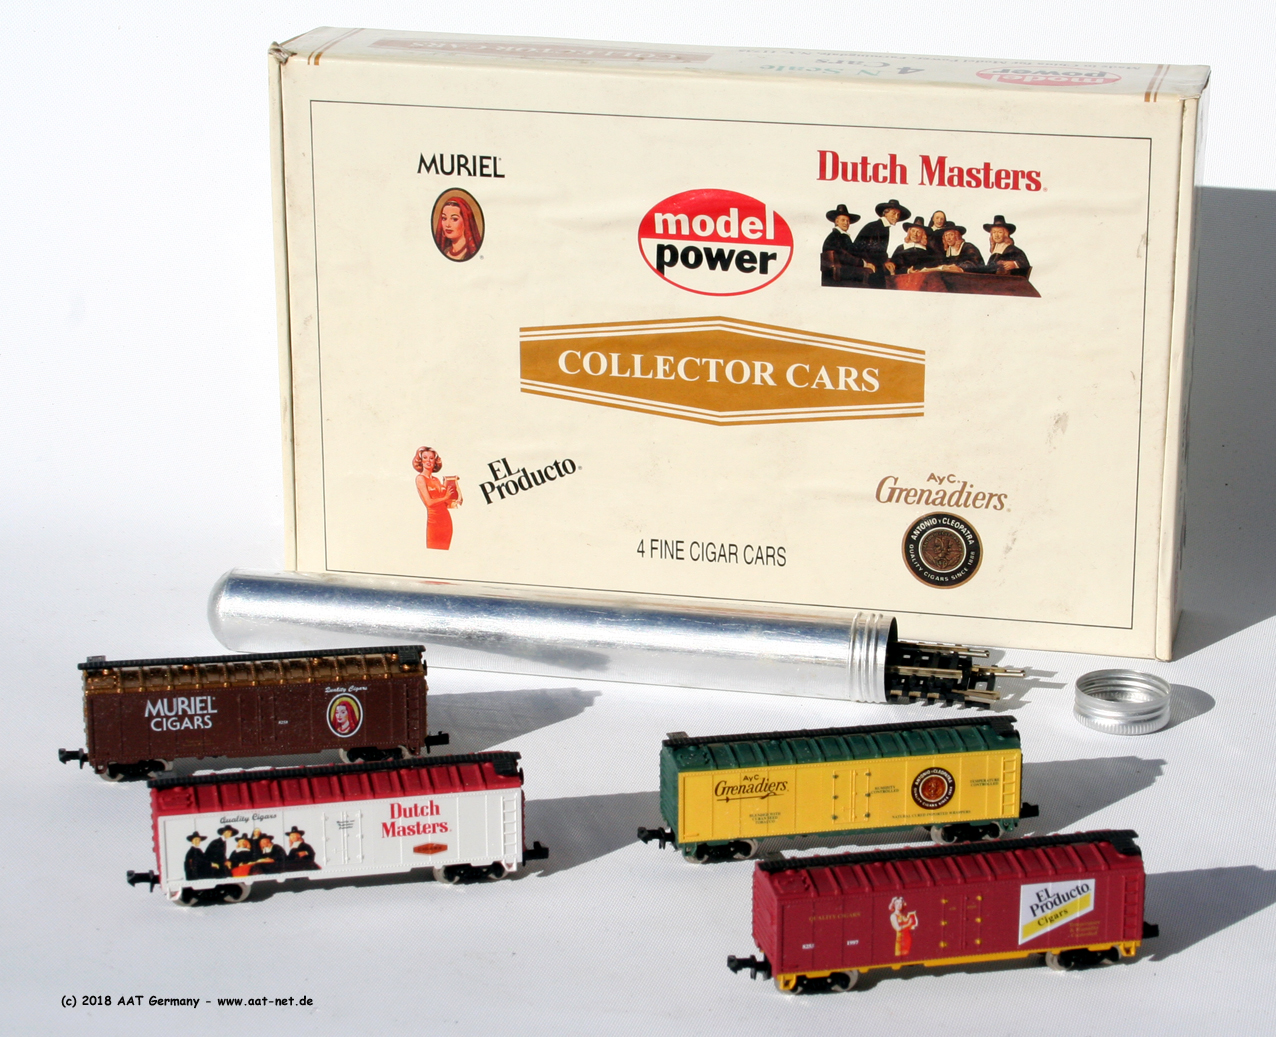 4 famous cigar brands